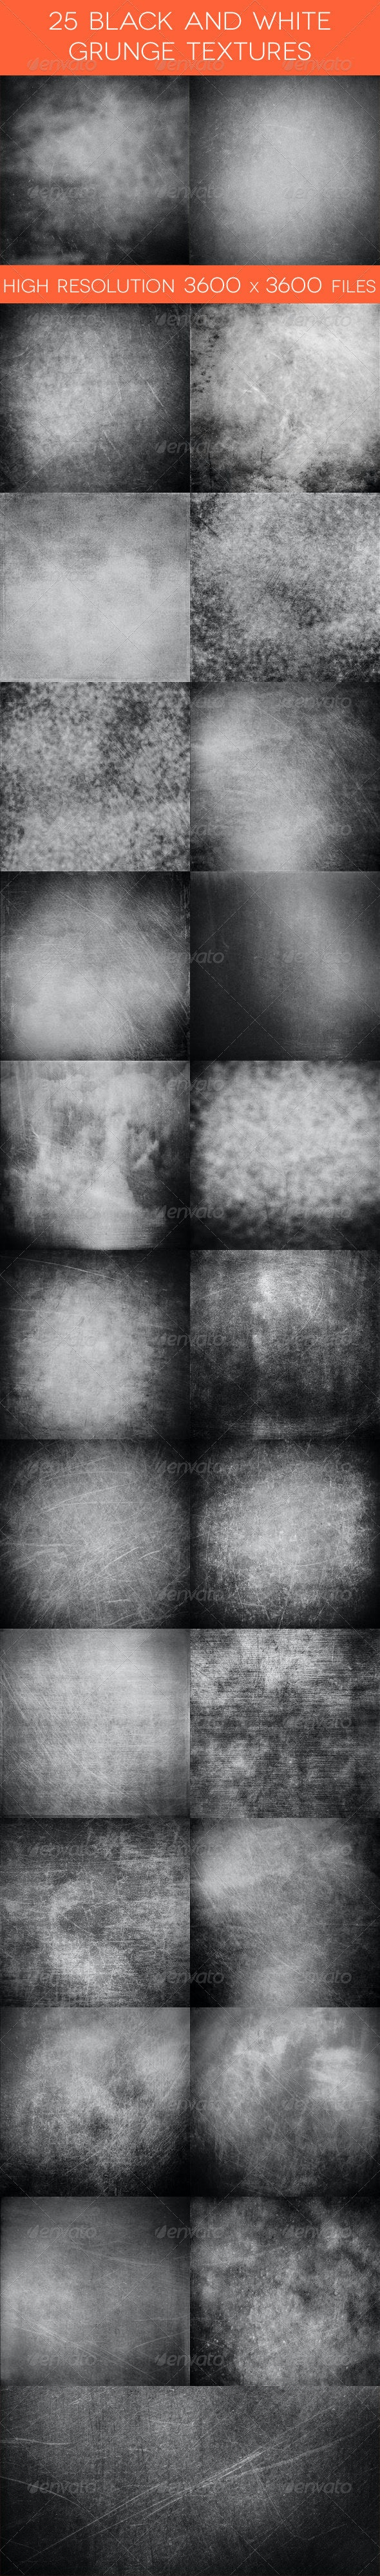 25 Black and White Grunge Textures - Industrial / Grunge Textures